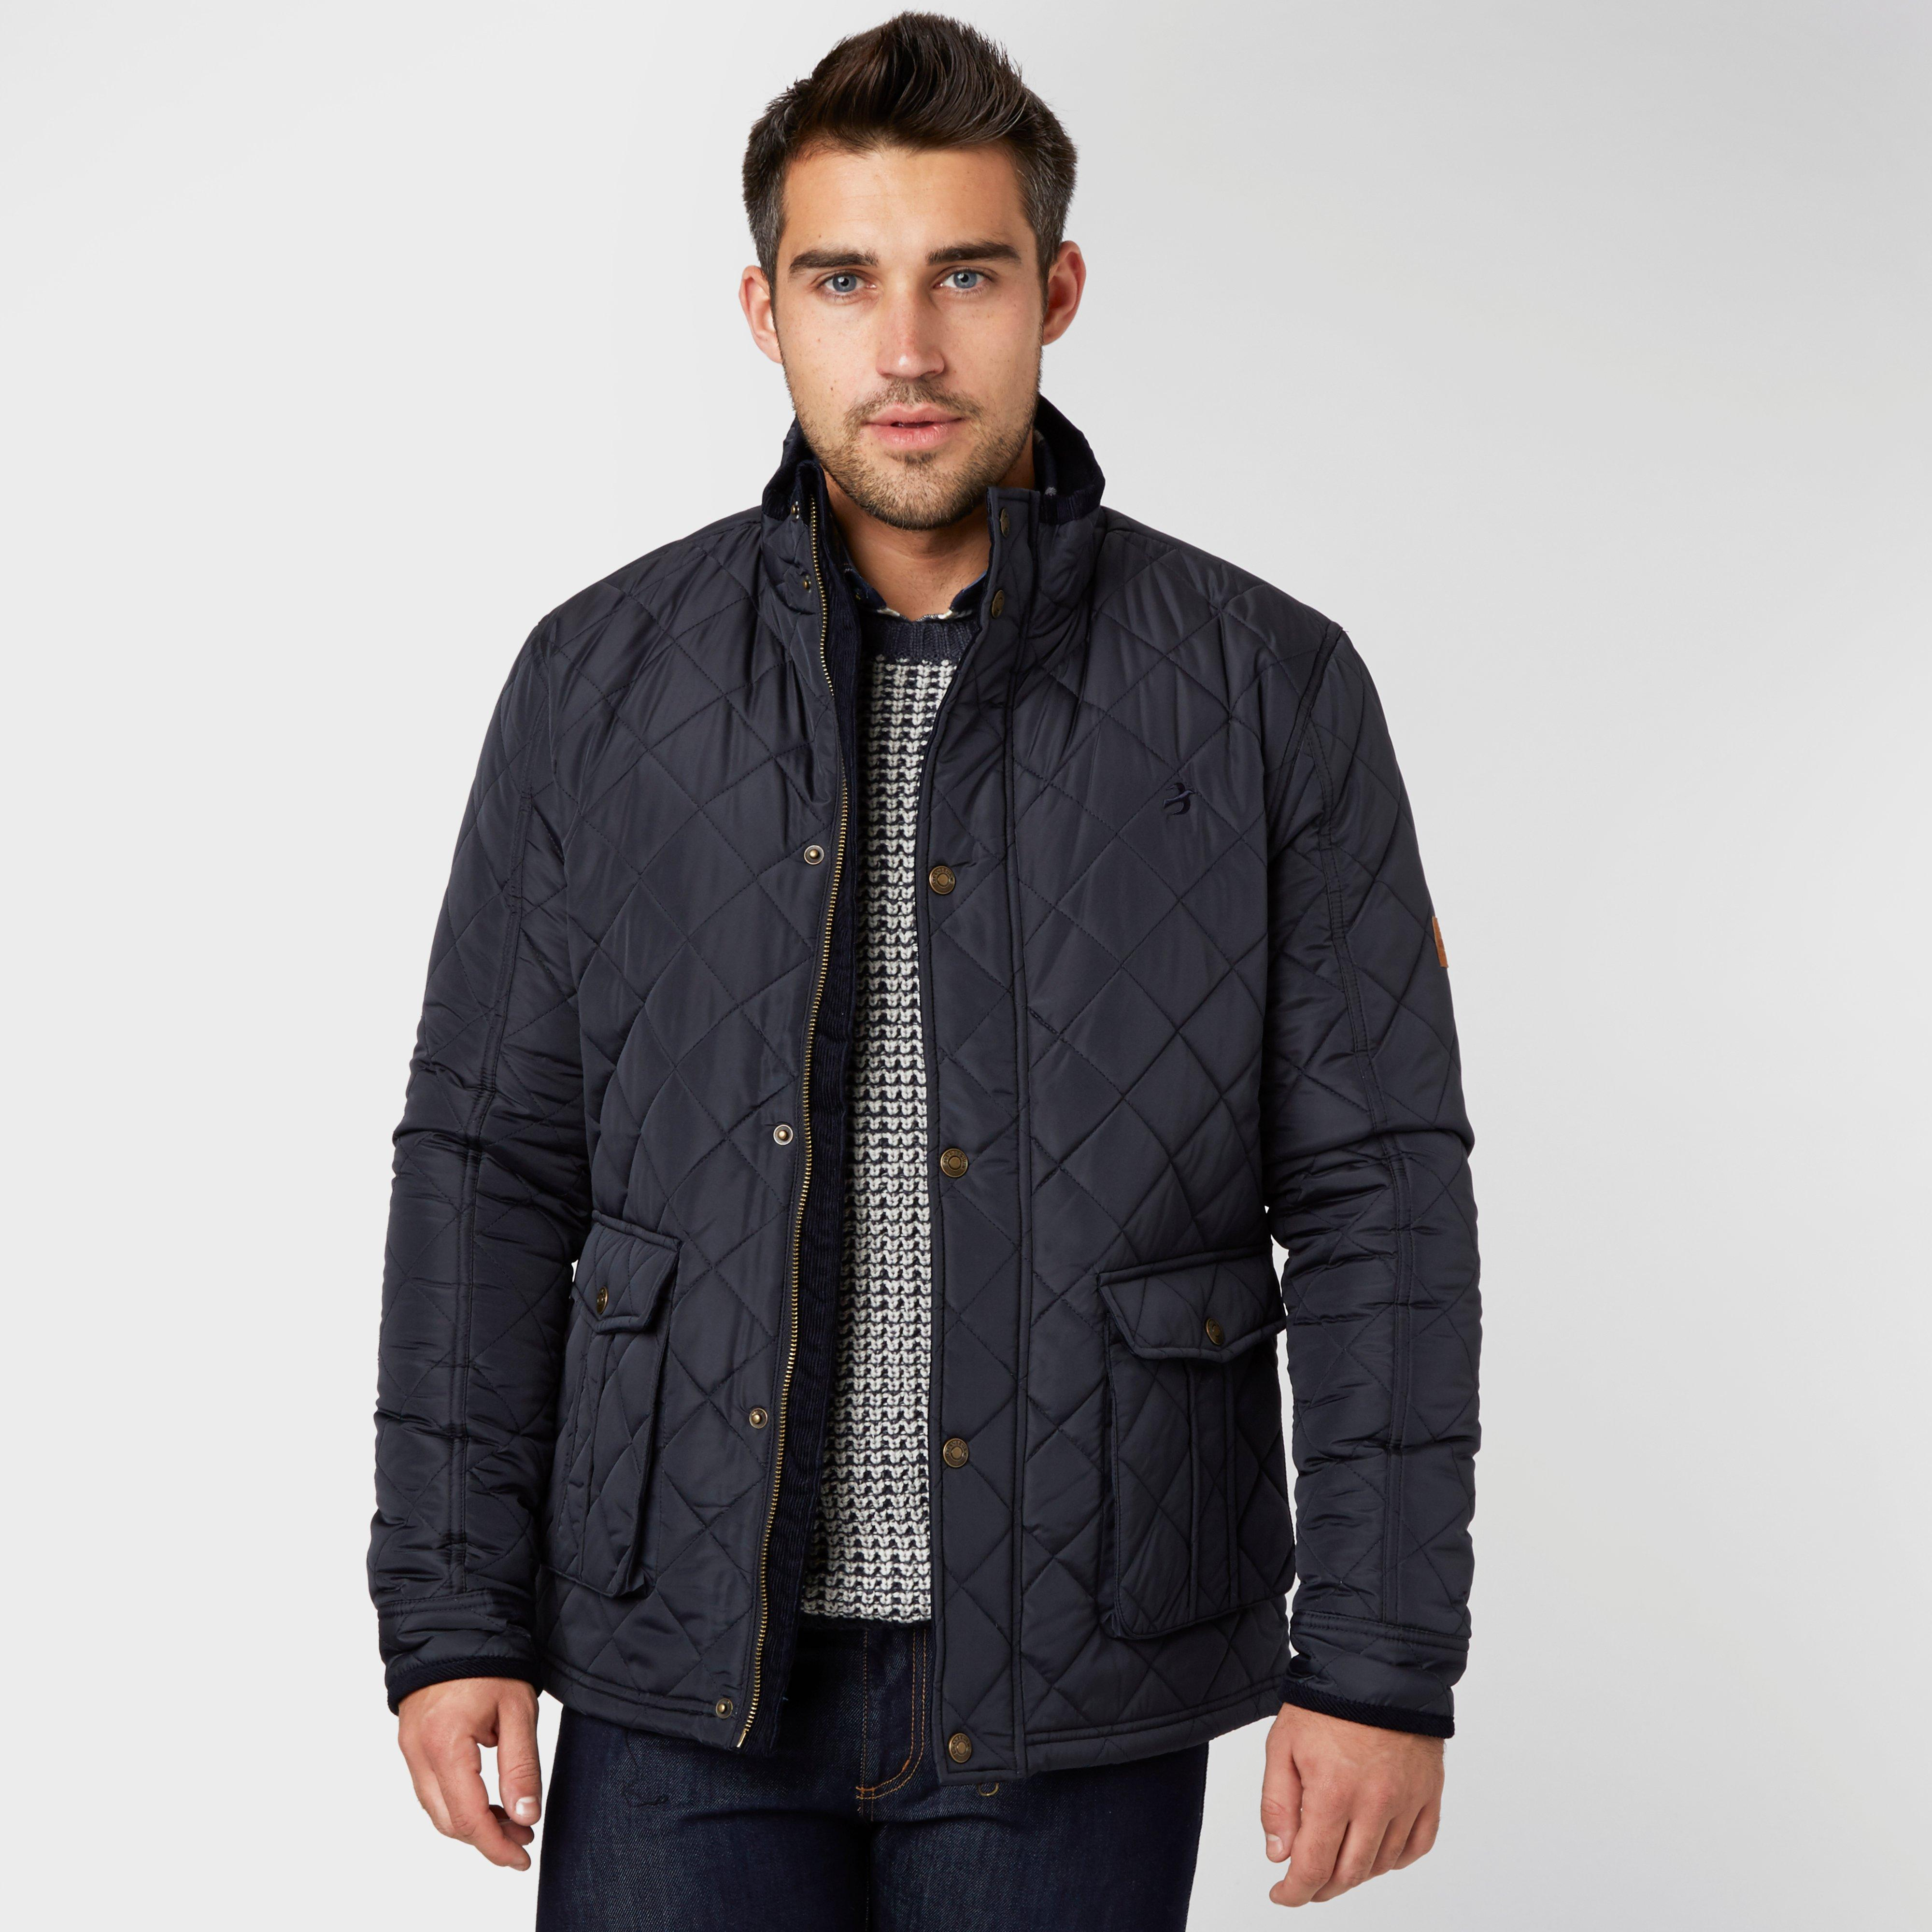 Brakeburn Men's Quilted Jacket, Navy | Bear Grylls UK | £37.50